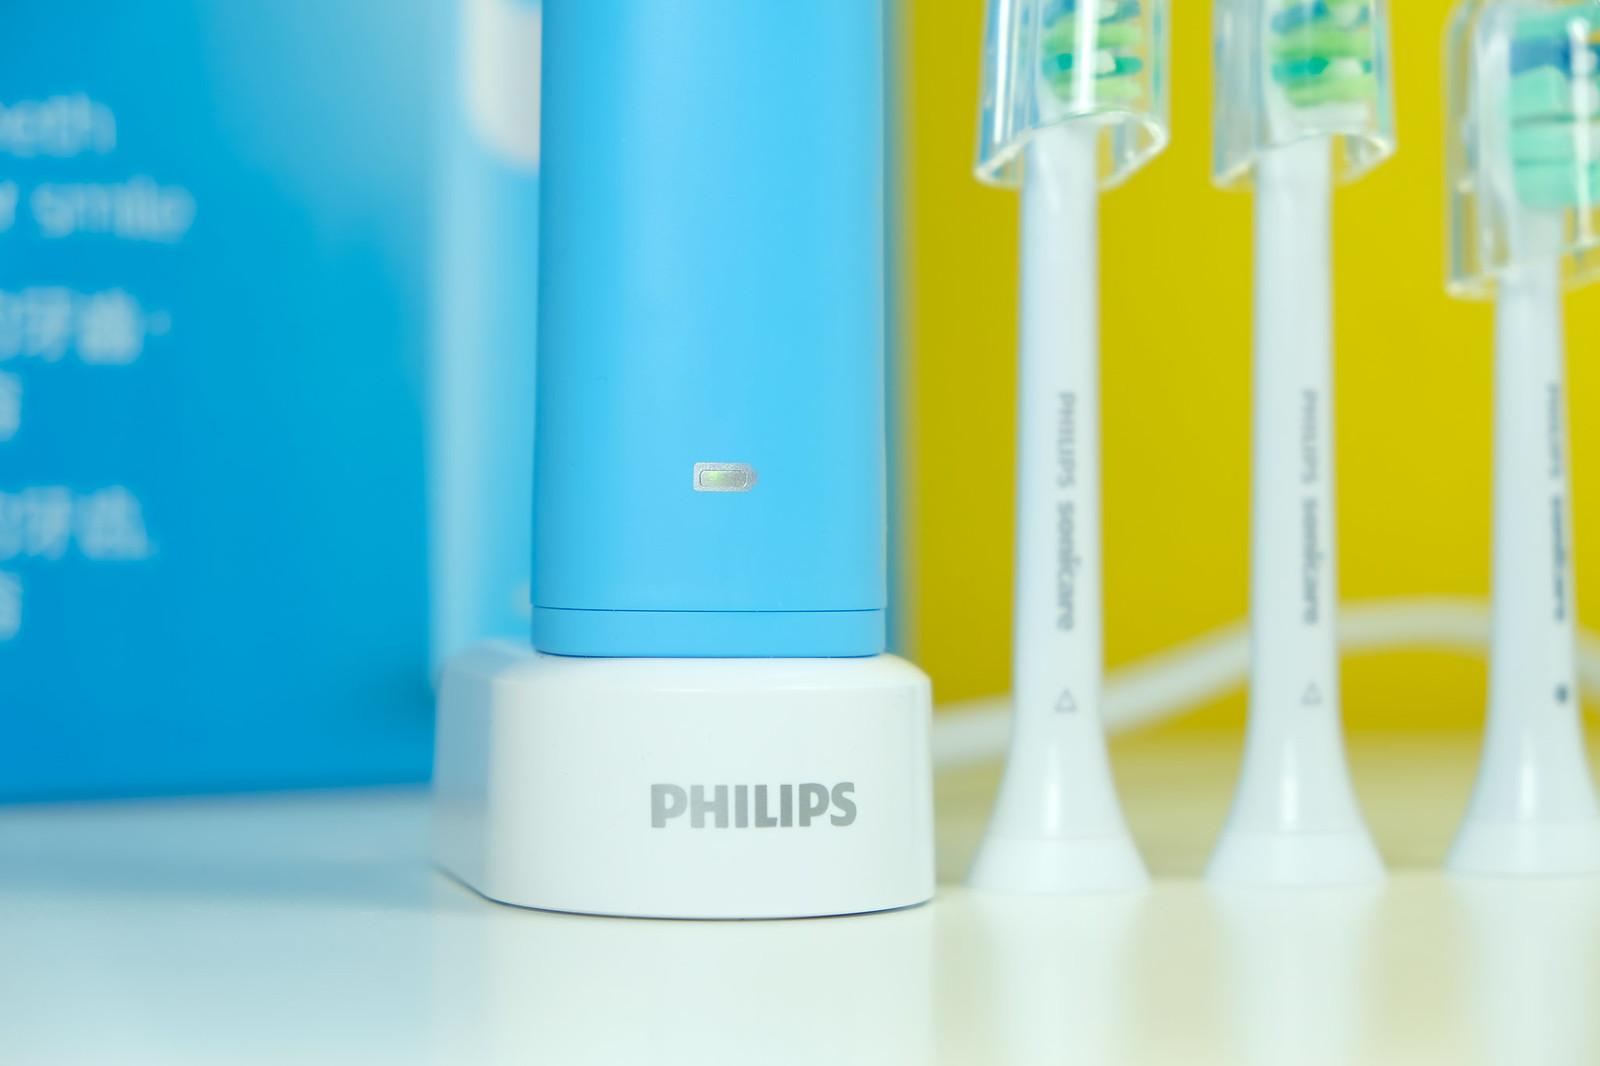 PHILIPS飛利浦 Sonicare 音波震動牙刷充電的樣子